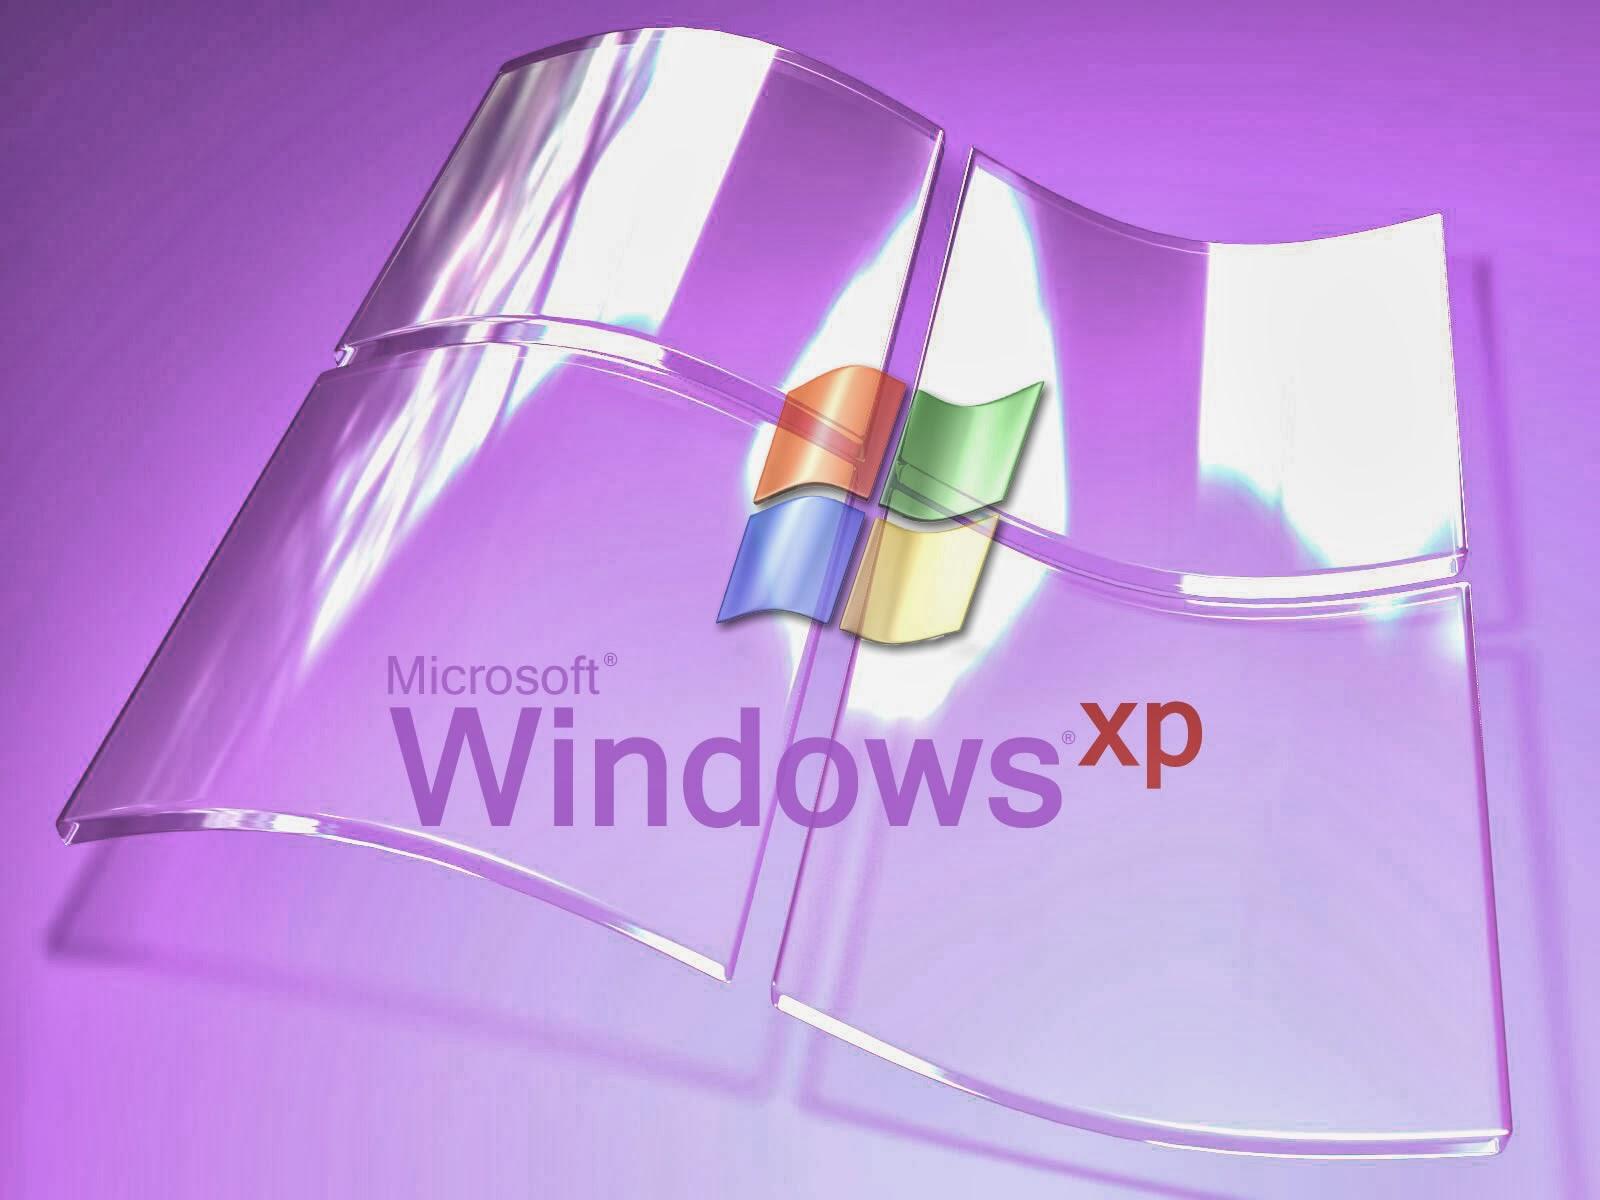 windows xp essay